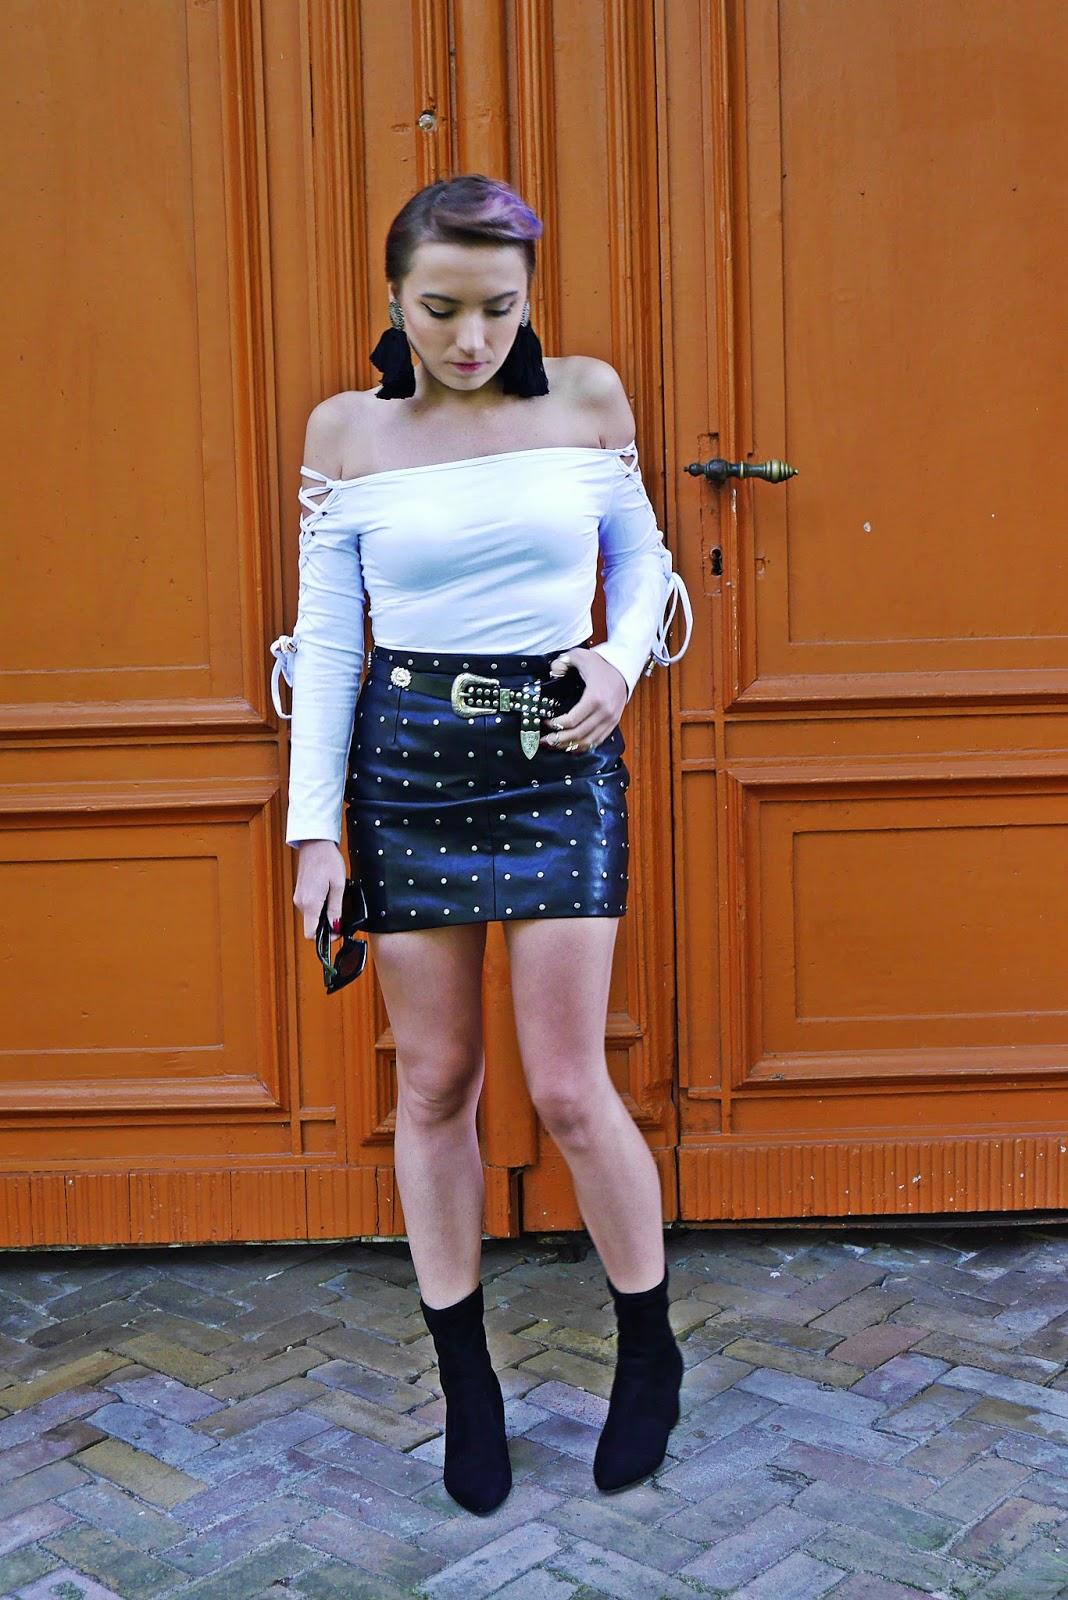 4_flower_sunglass_leather_skirt_socks_shoes_belt_white_top_karyn_blog_modowy_110917afgh